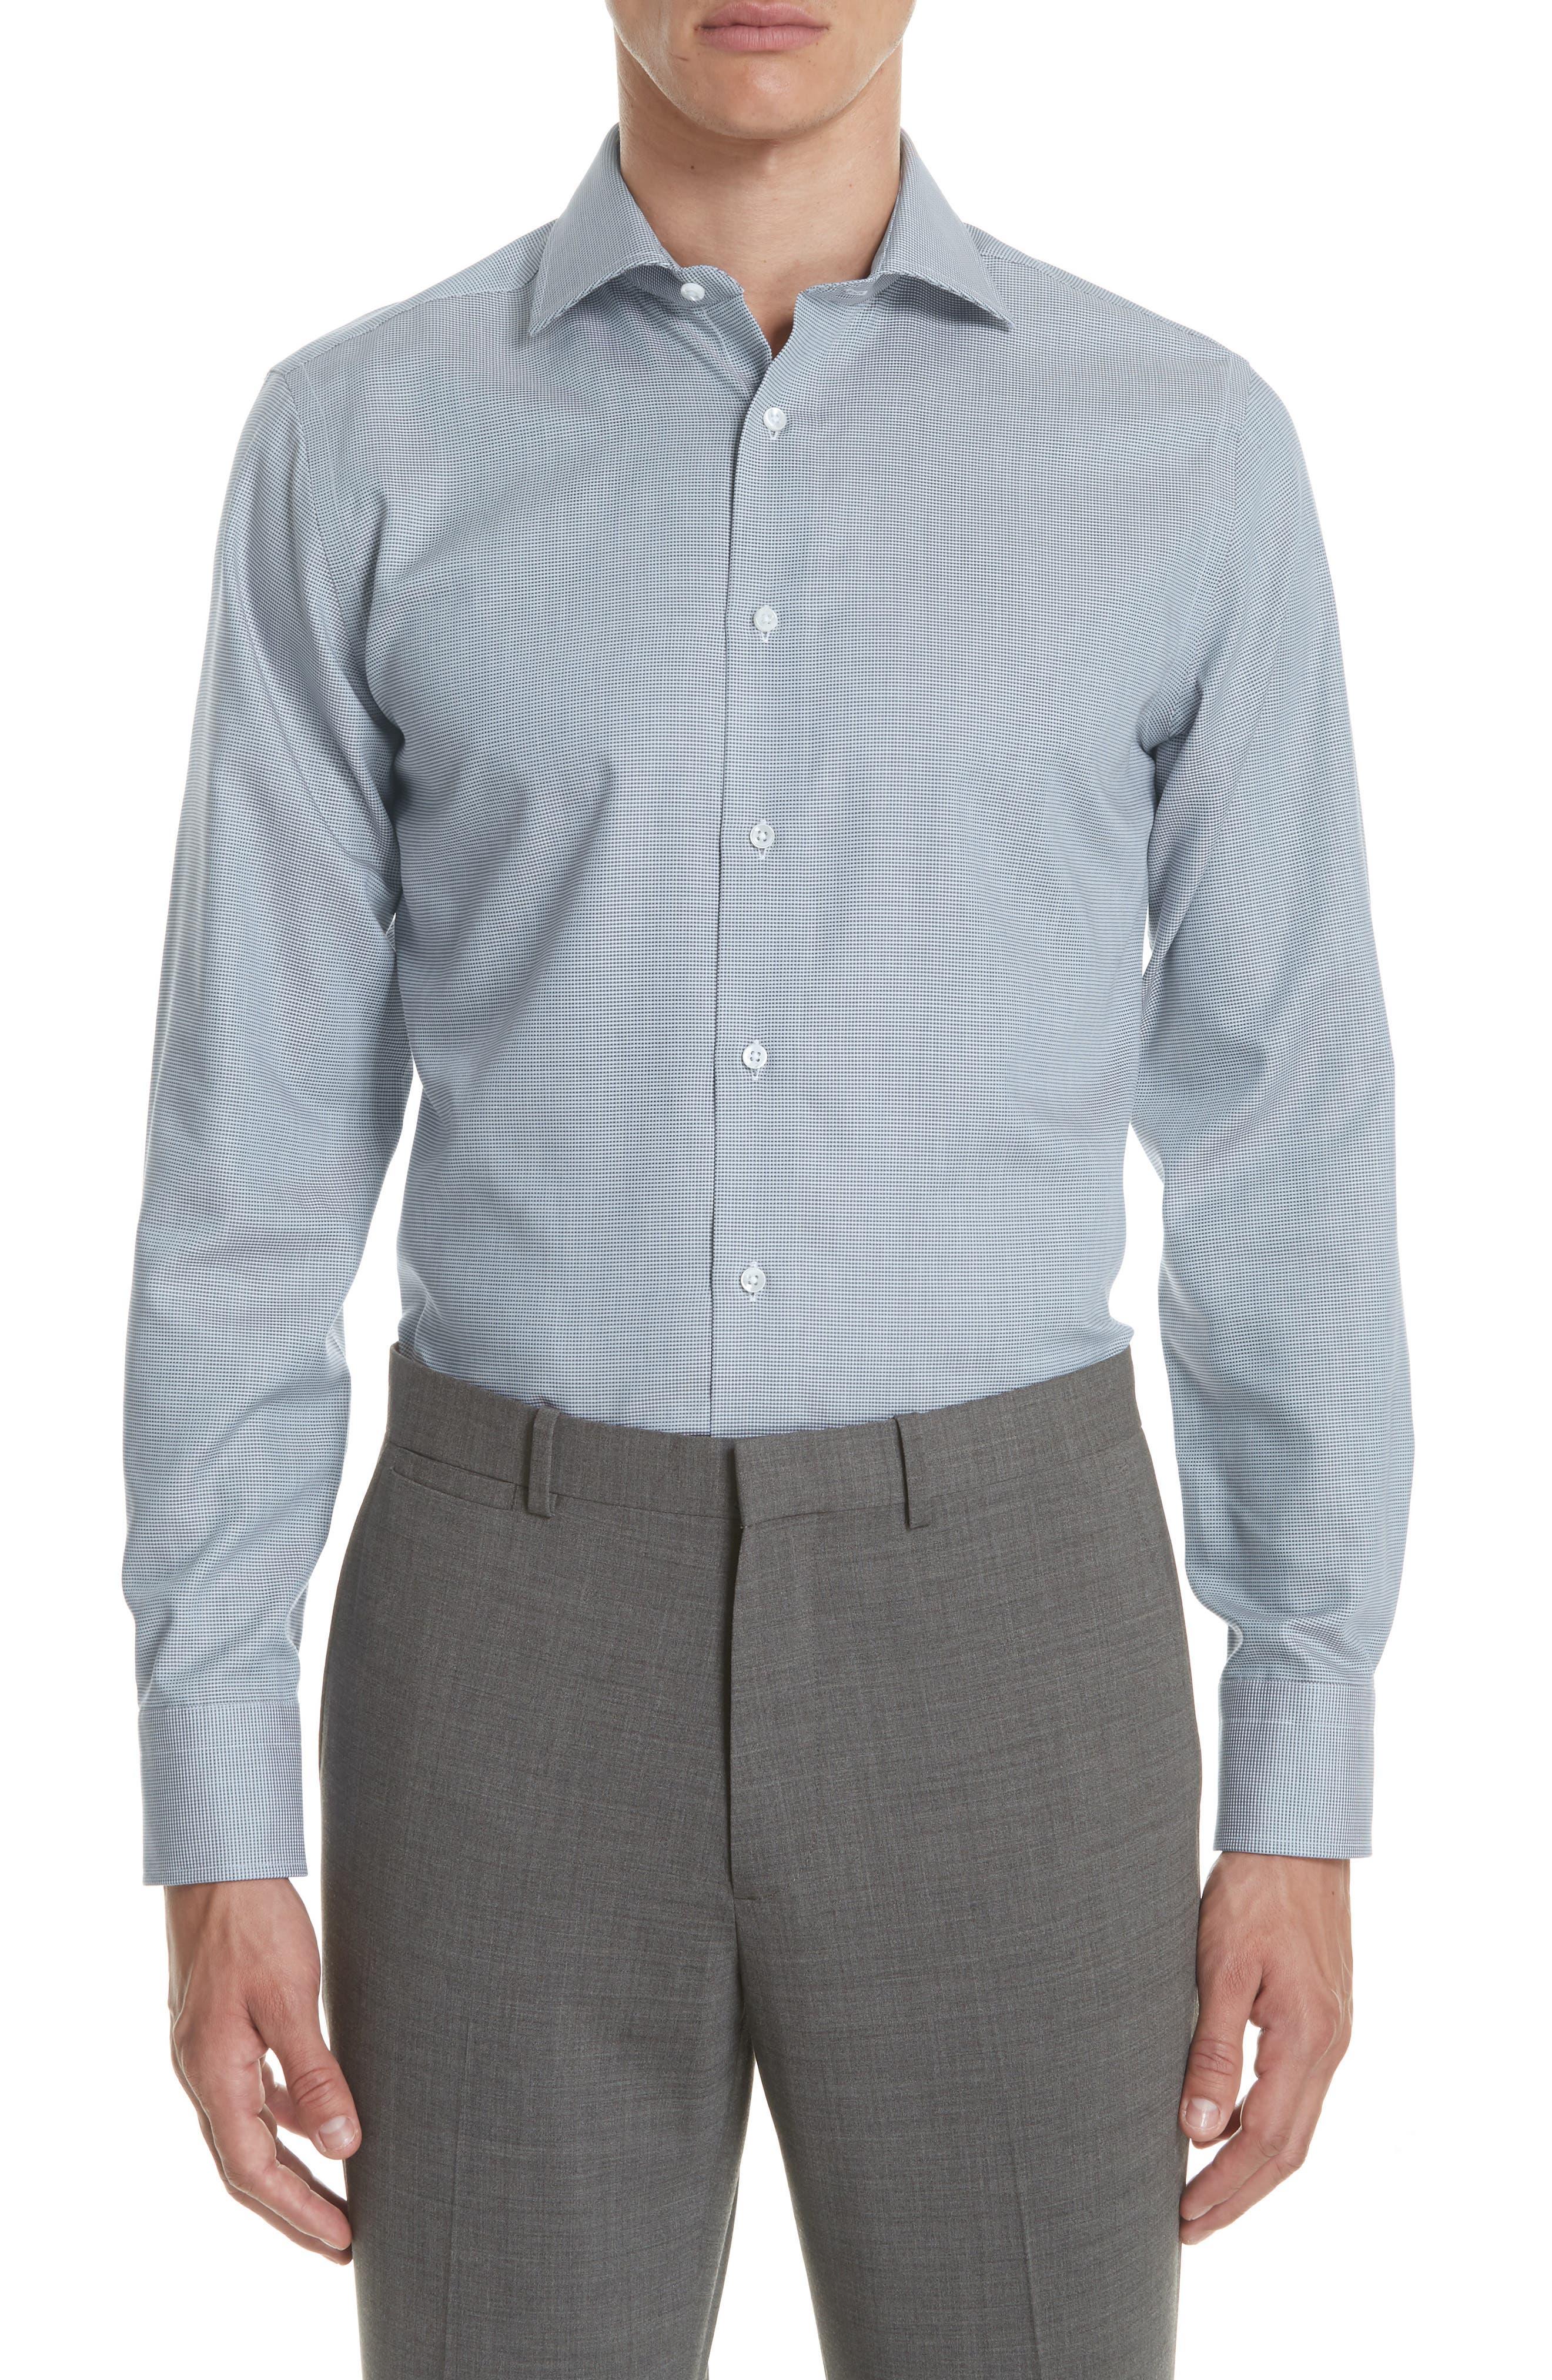 Regular Fit Solid Dress Shirt,                             Main thumbnail 1, color,                             Brown